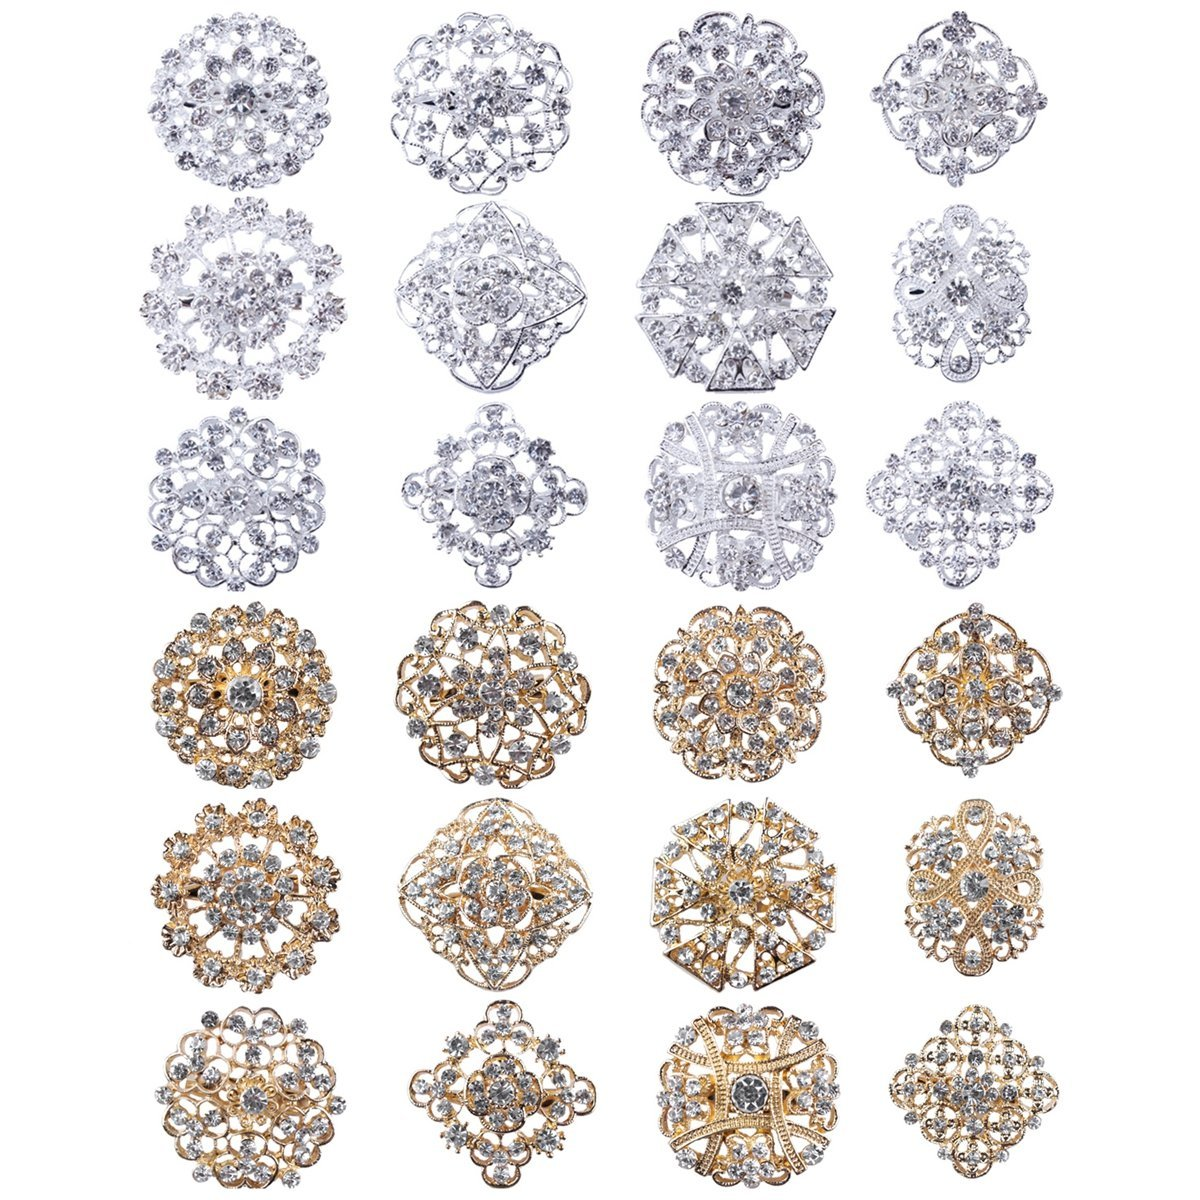 Mutian Fashion Lot 24pc Clear Rhinestone Crystal Flower Brooches Pins Set DIY Wedding Bouquet Broaches Kit